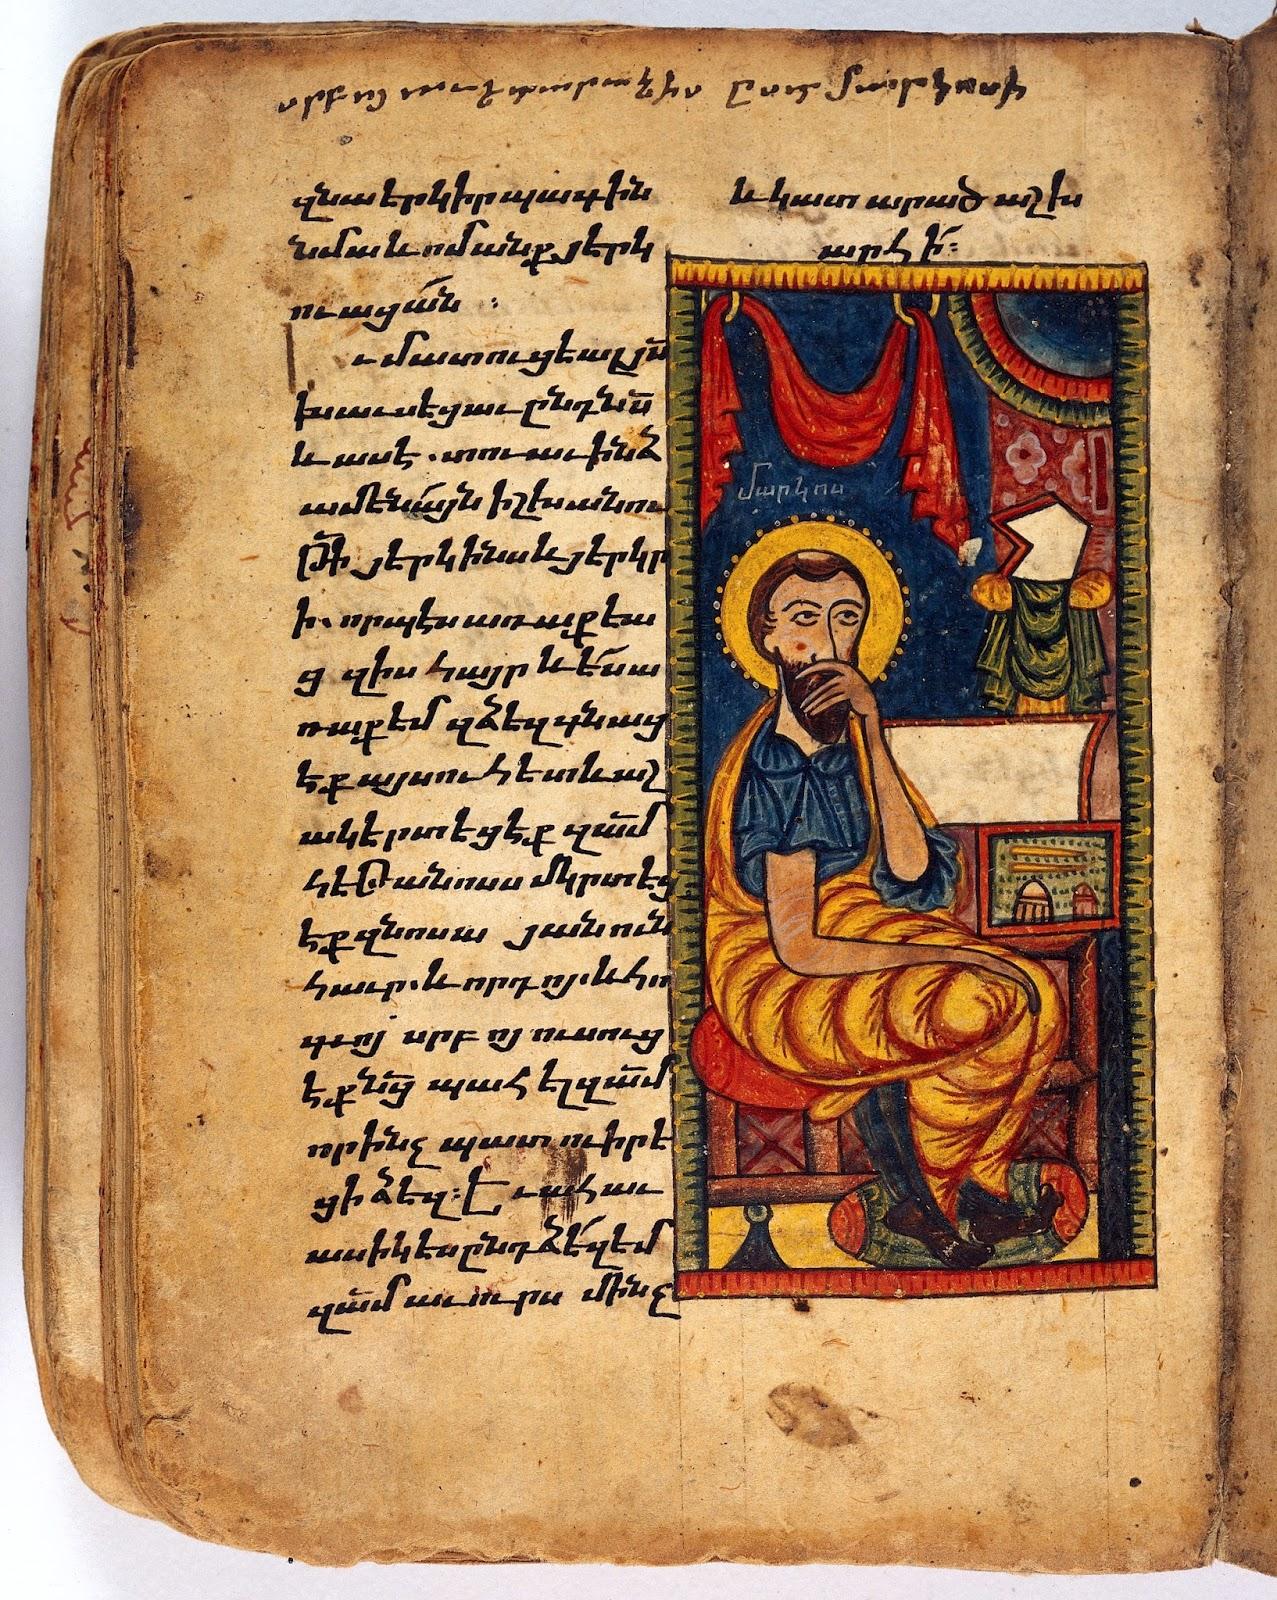 What is Saint Joshua the patron saint of?